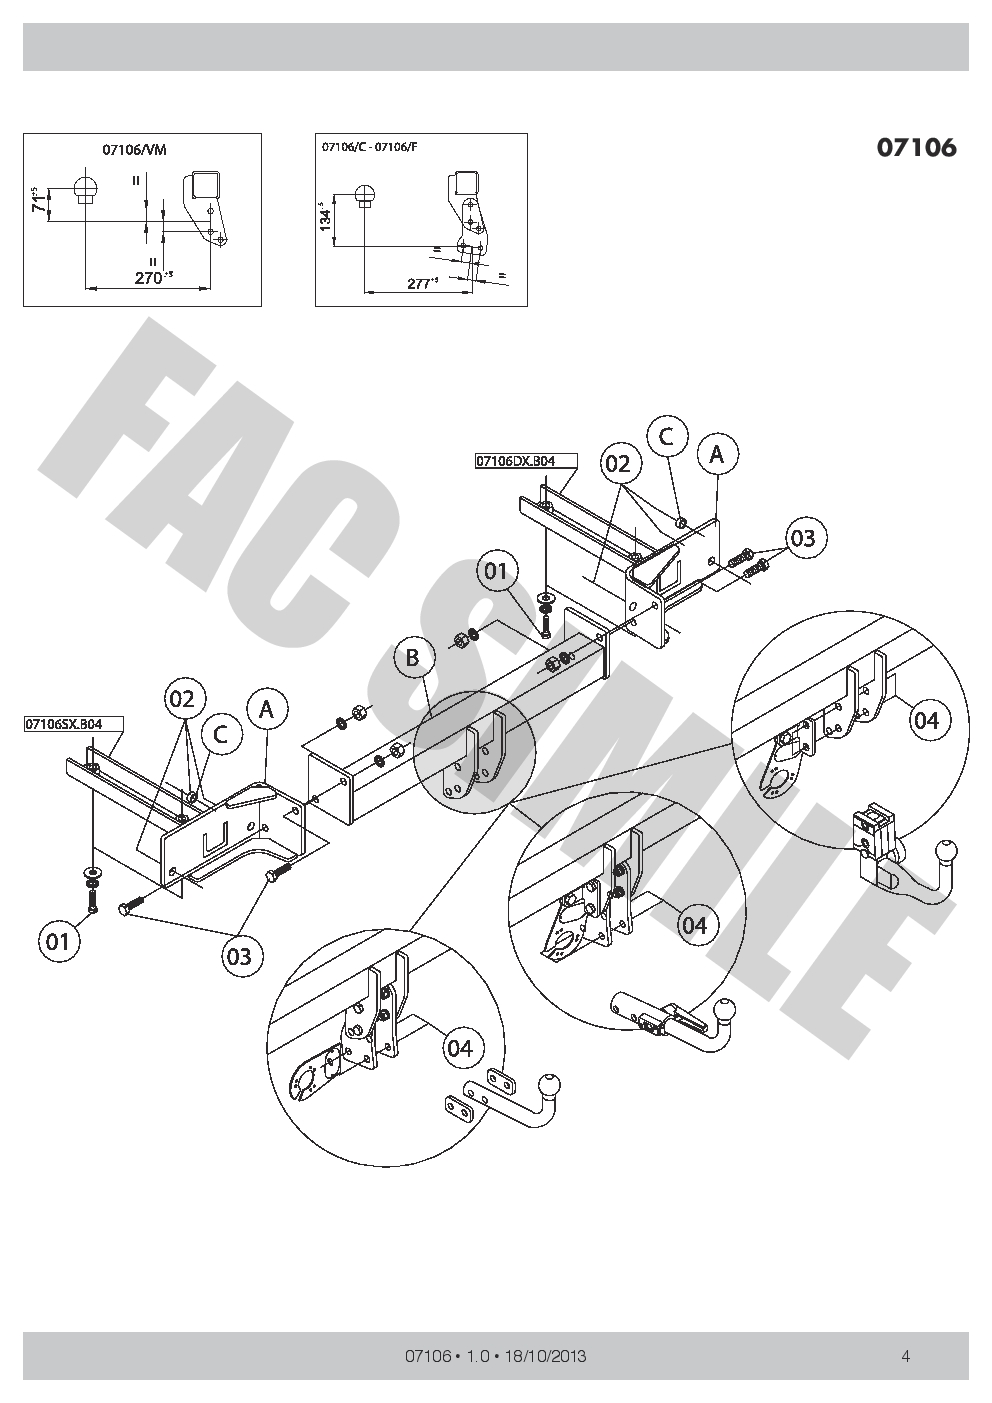 Swan Neck Towbar 7pin Bypass Relay for Opel Vauxhall Zafira Tourer 11-on 0710/_A1